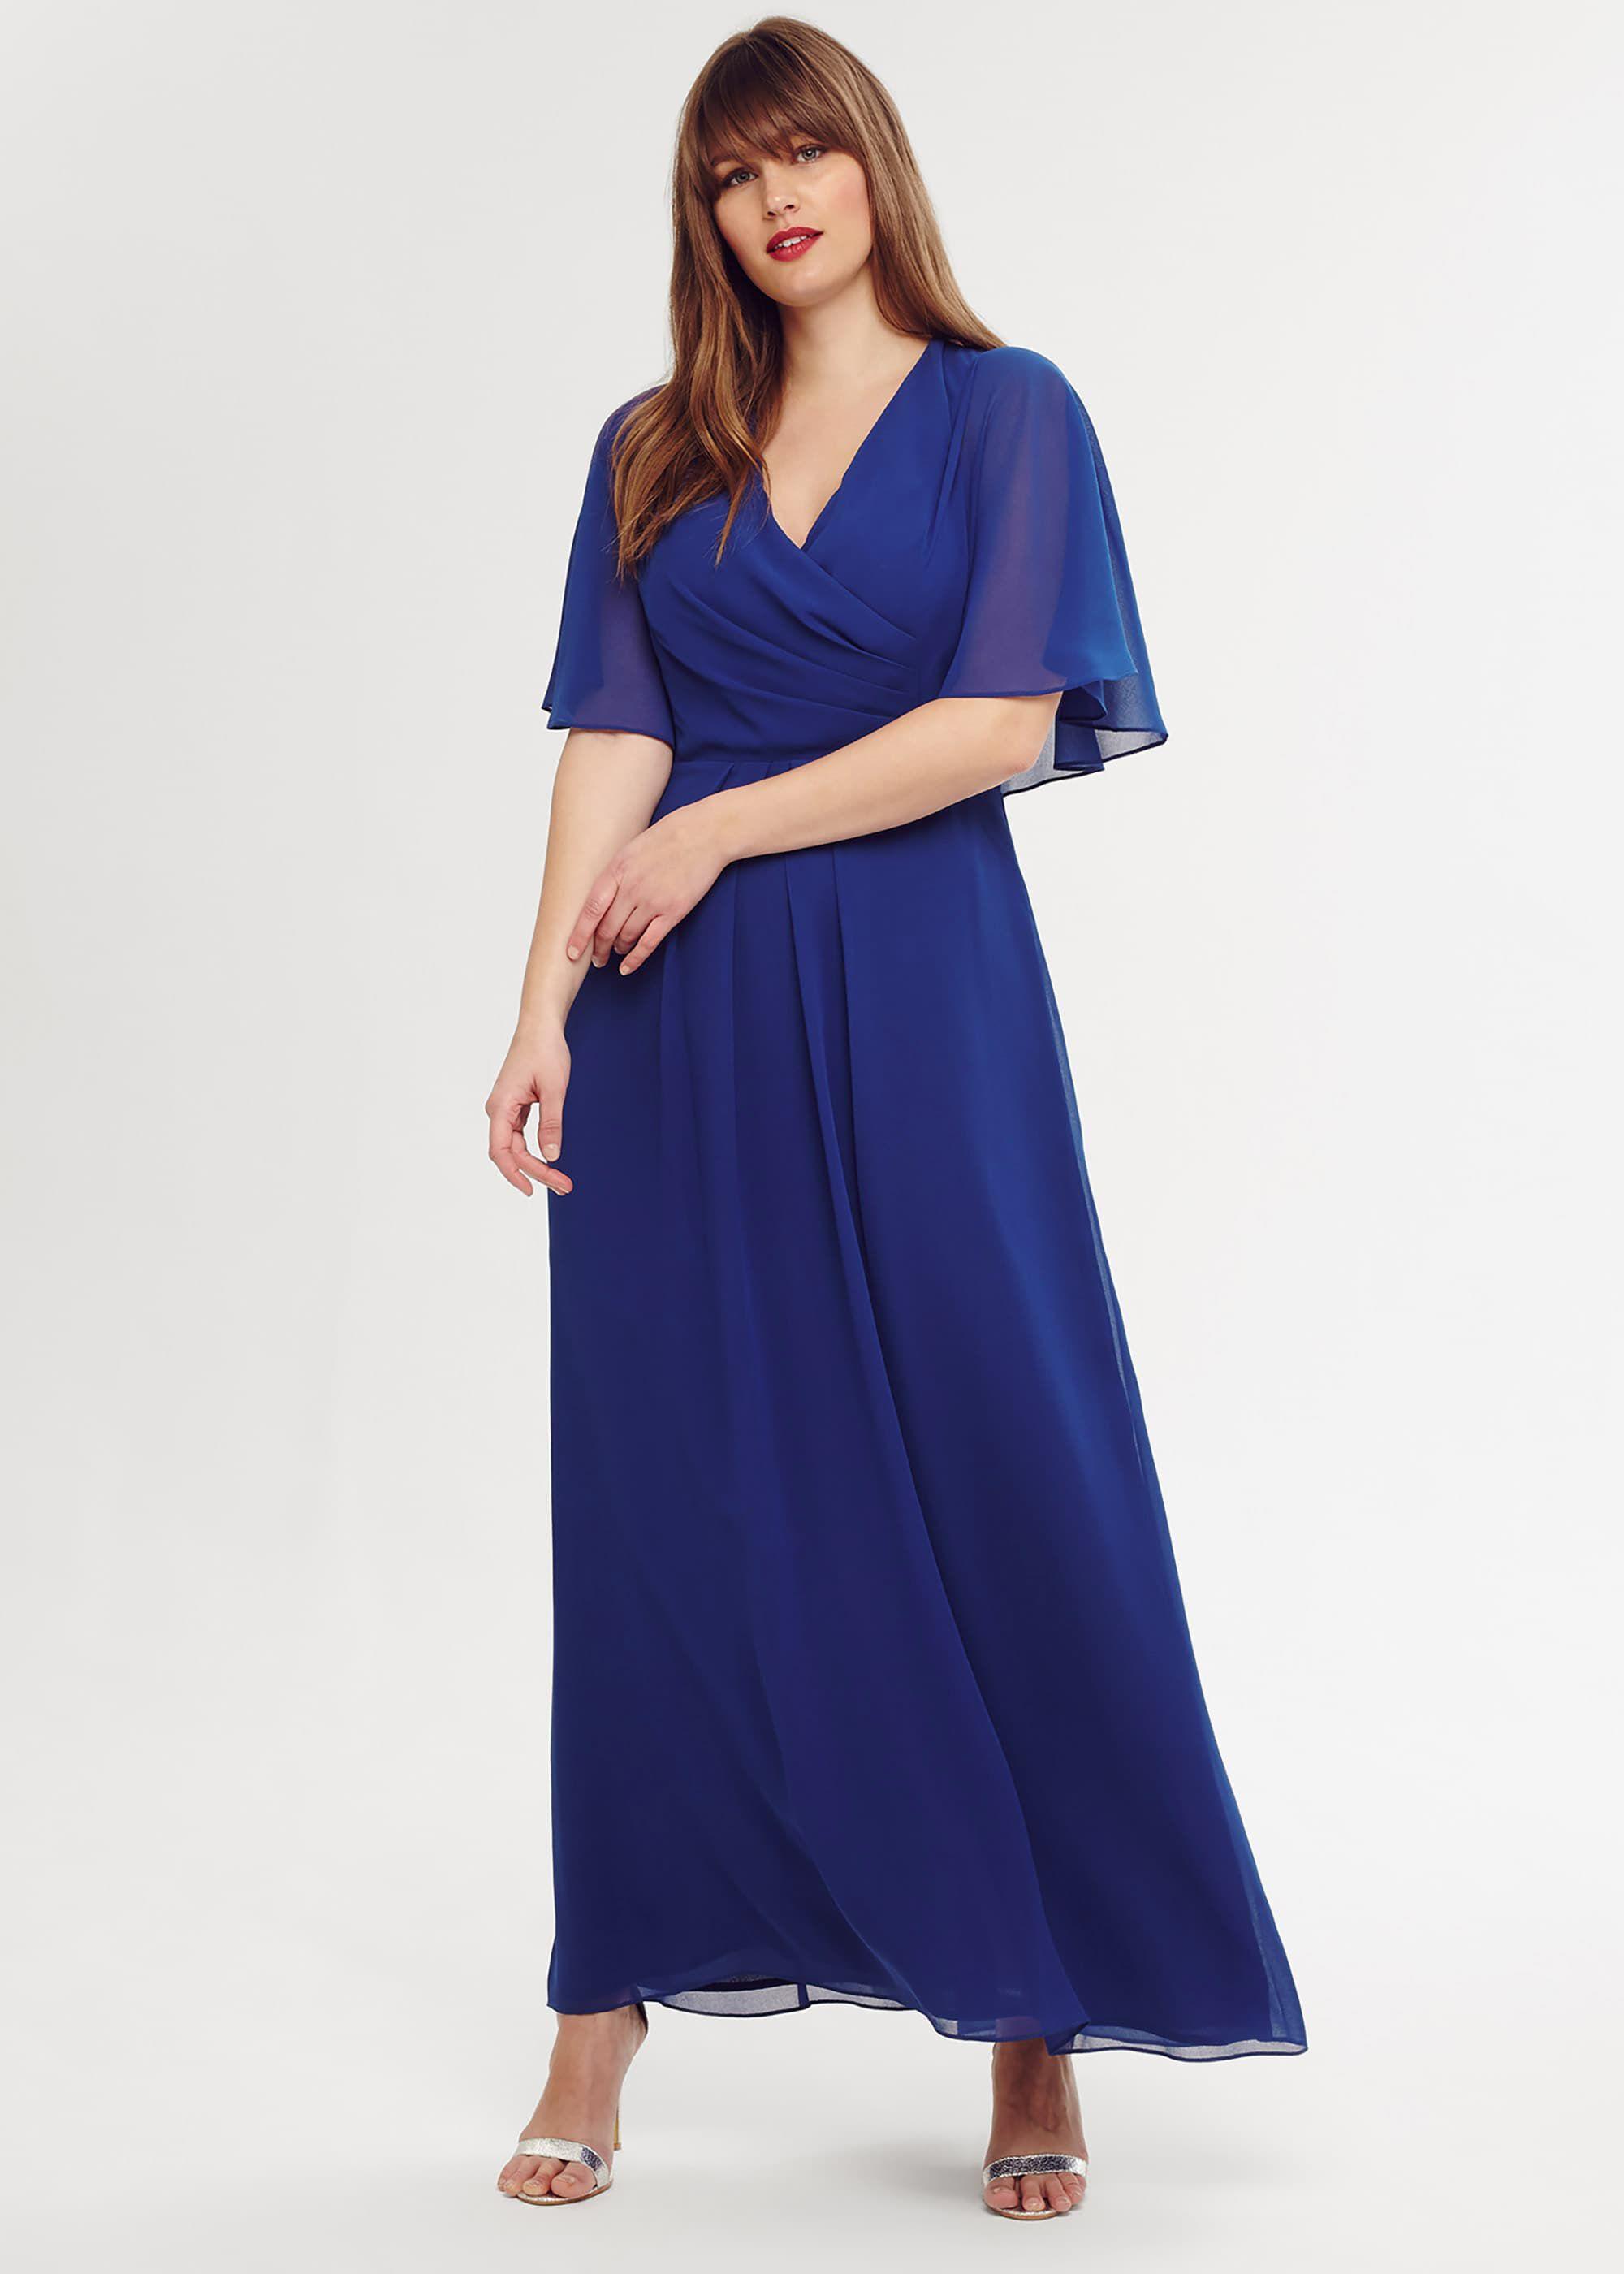 Opal Maxi Bridesmaid Dress | Phase Eight